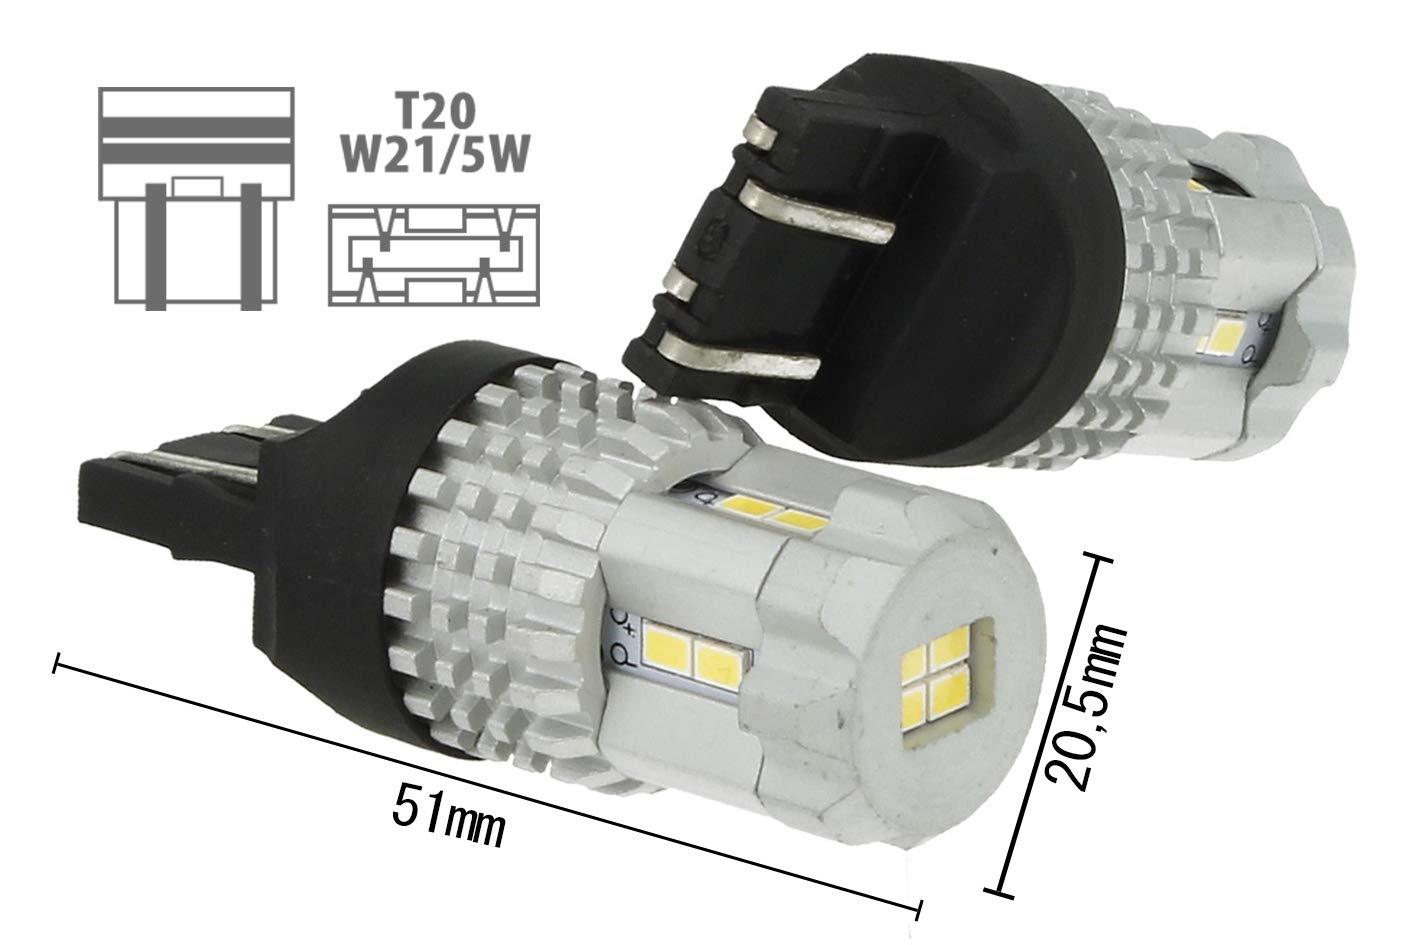 lámpara LED T20 7443 W21/w 12 SMD 3020 Blanco Super luminoso Luces ...